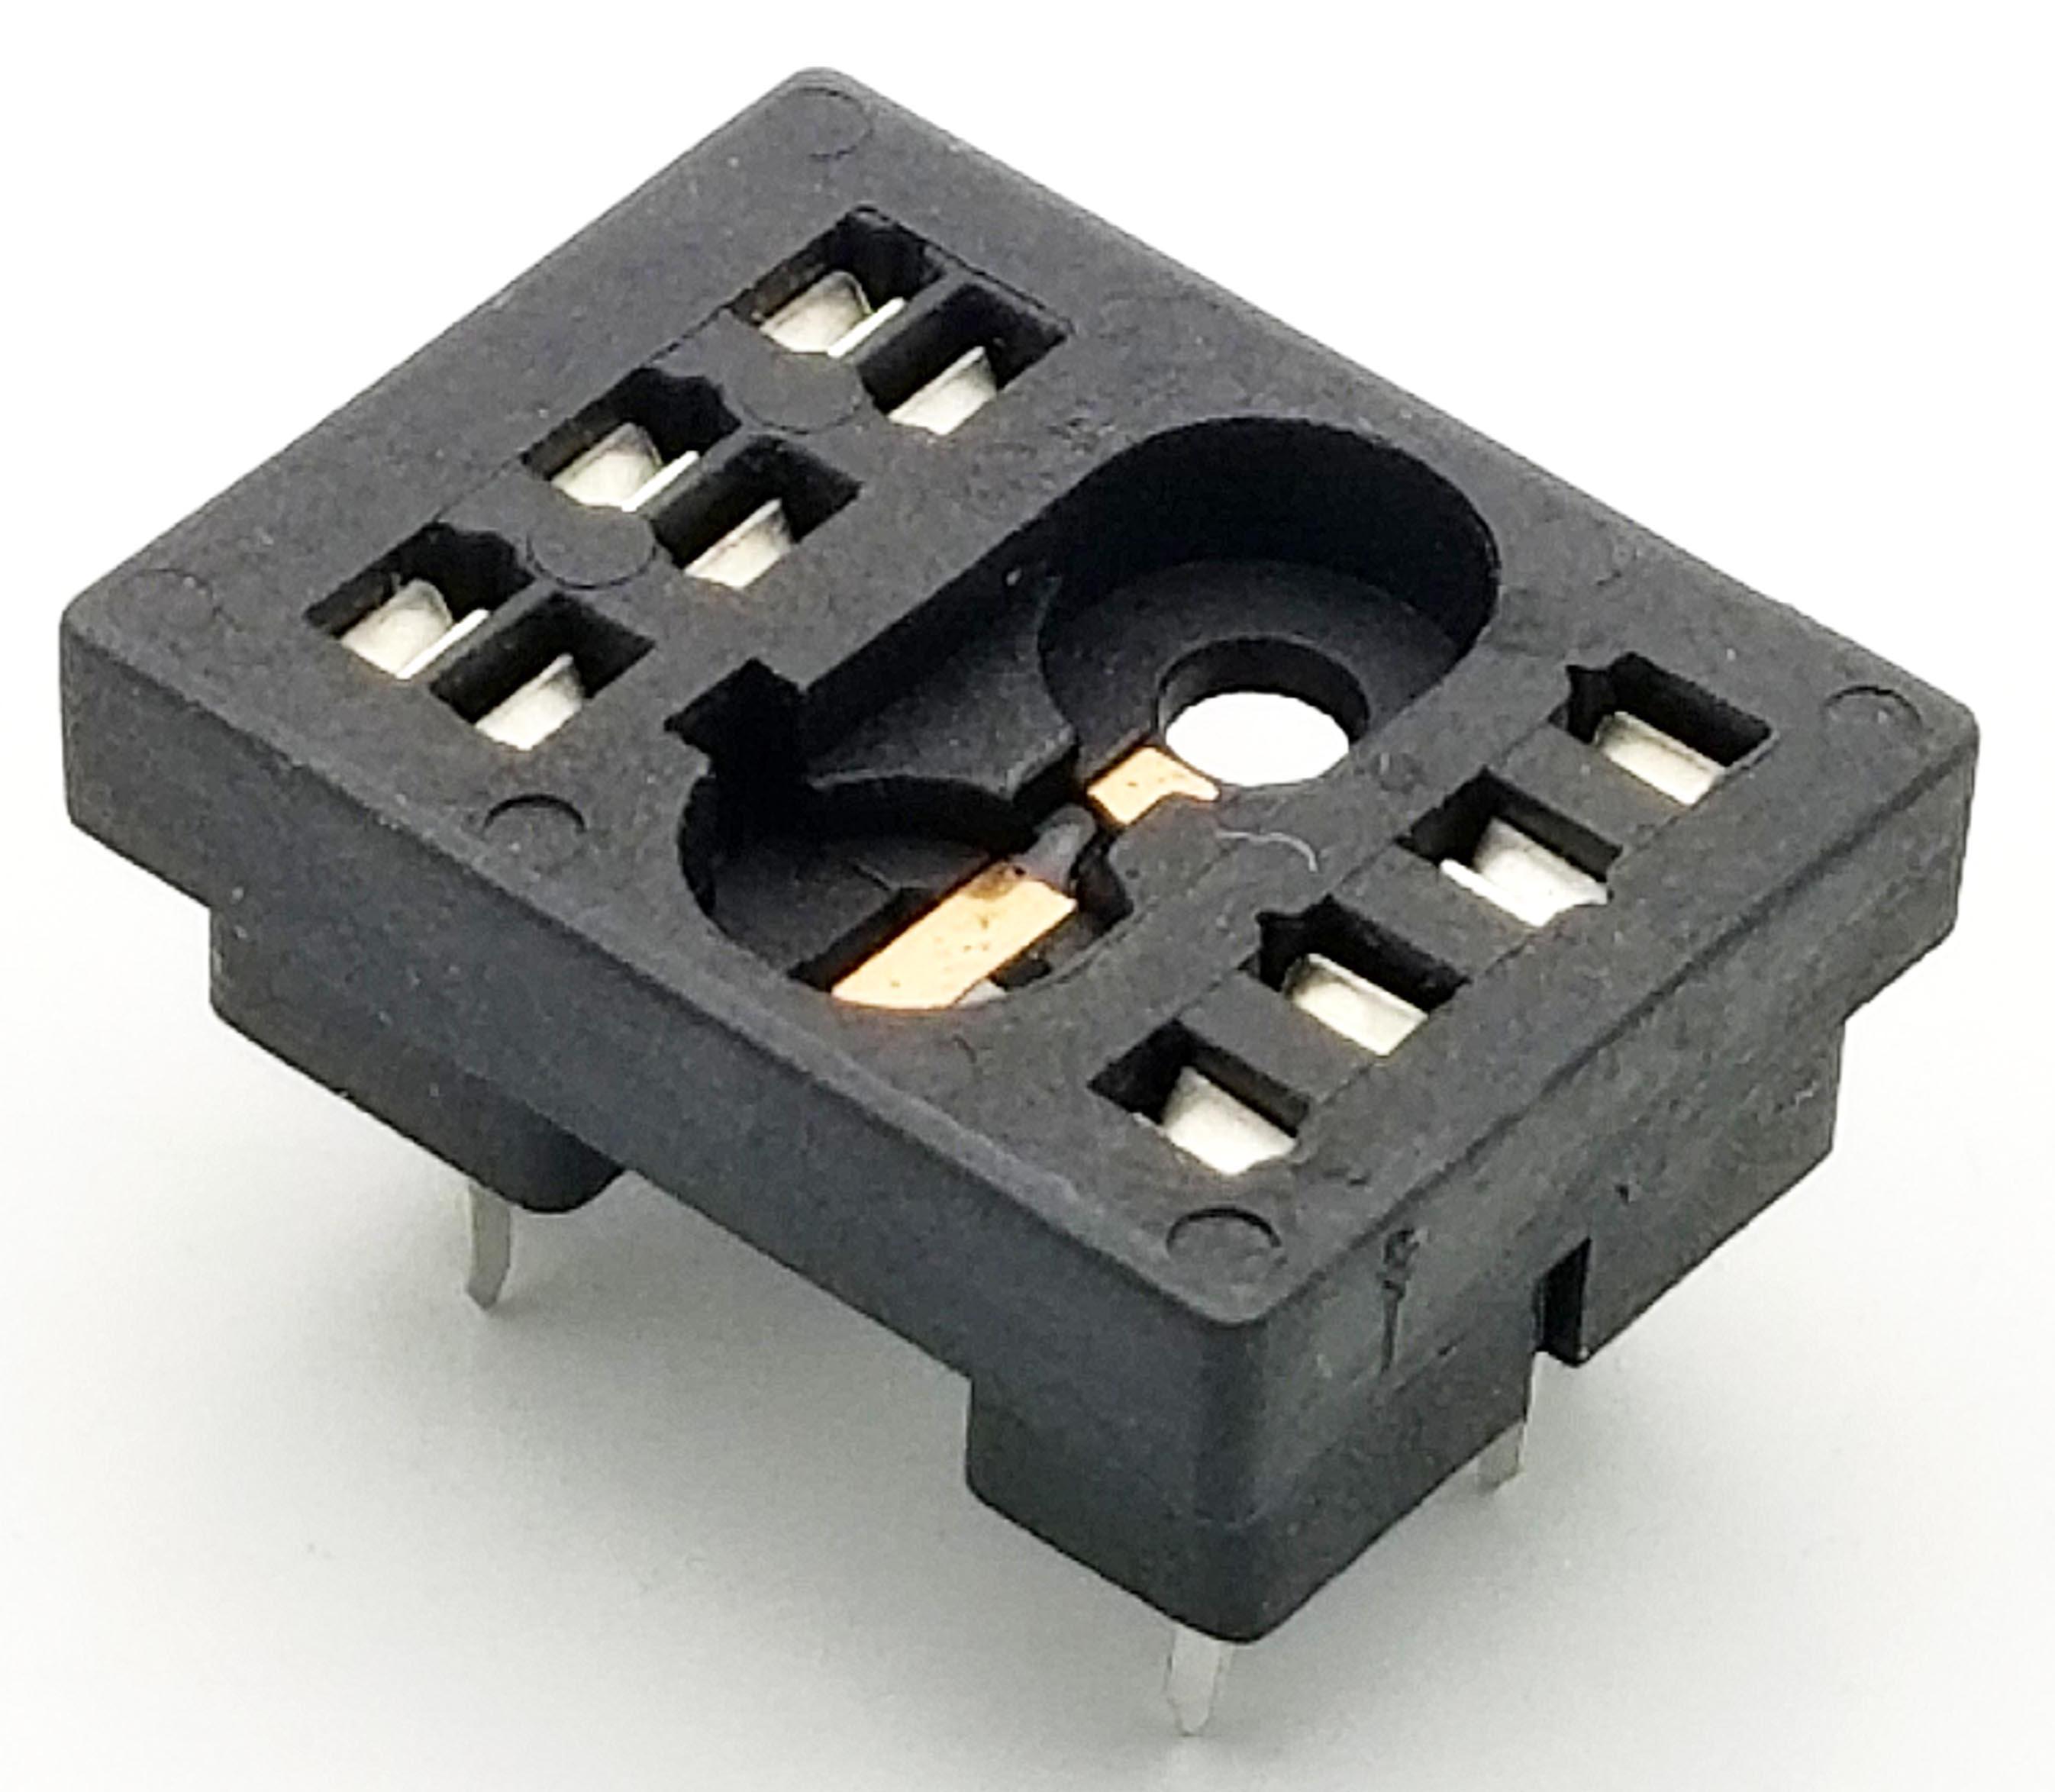 10 Pin Mini Blade Relay Socket Pcb Mount Spdt 12v 5a